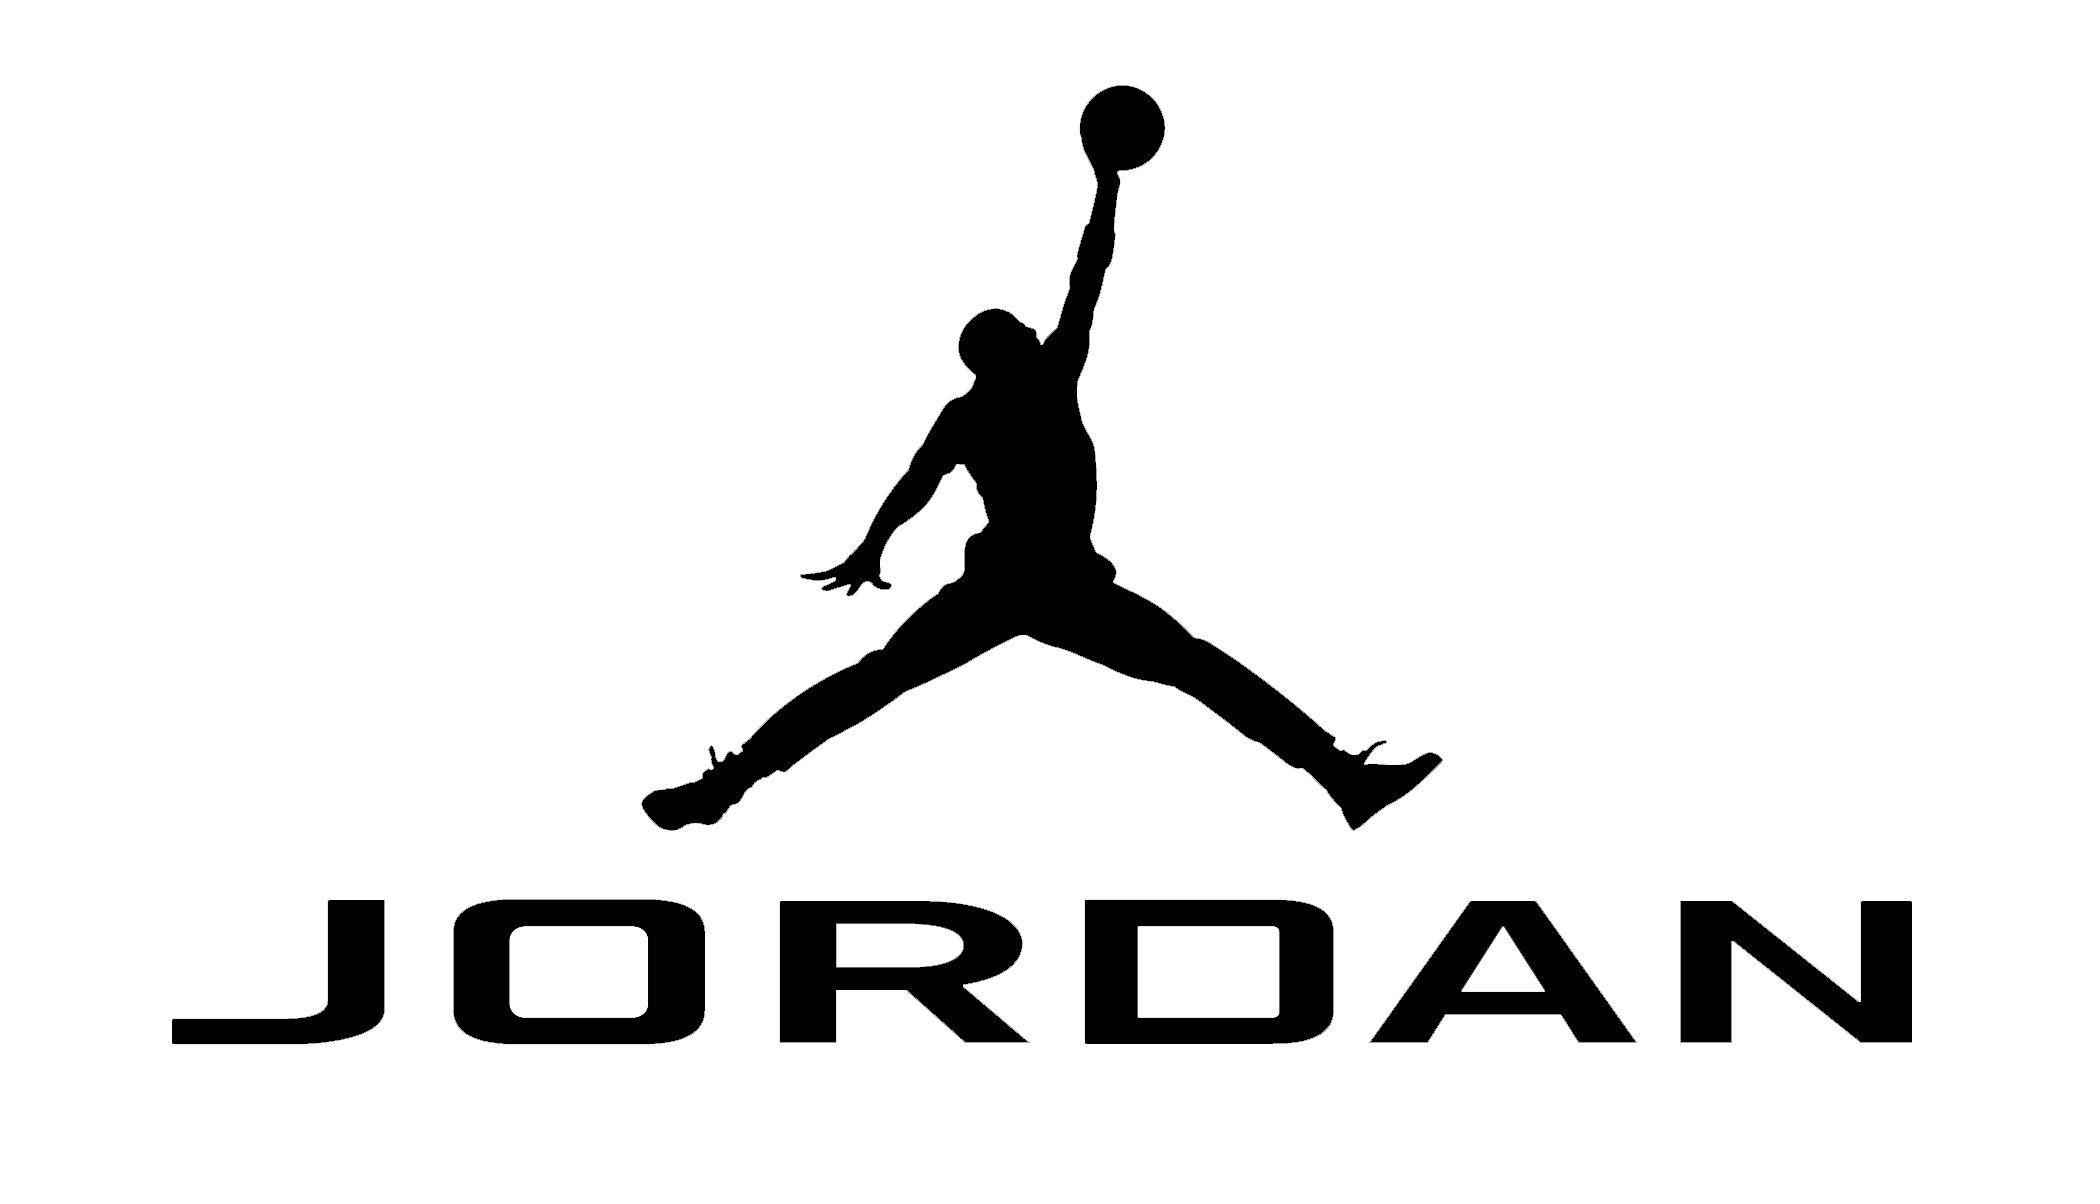 Logo Jordan Coloring Pages Jordan Logo Wallpaper Logo Wallpaper Hd Jordan Logo